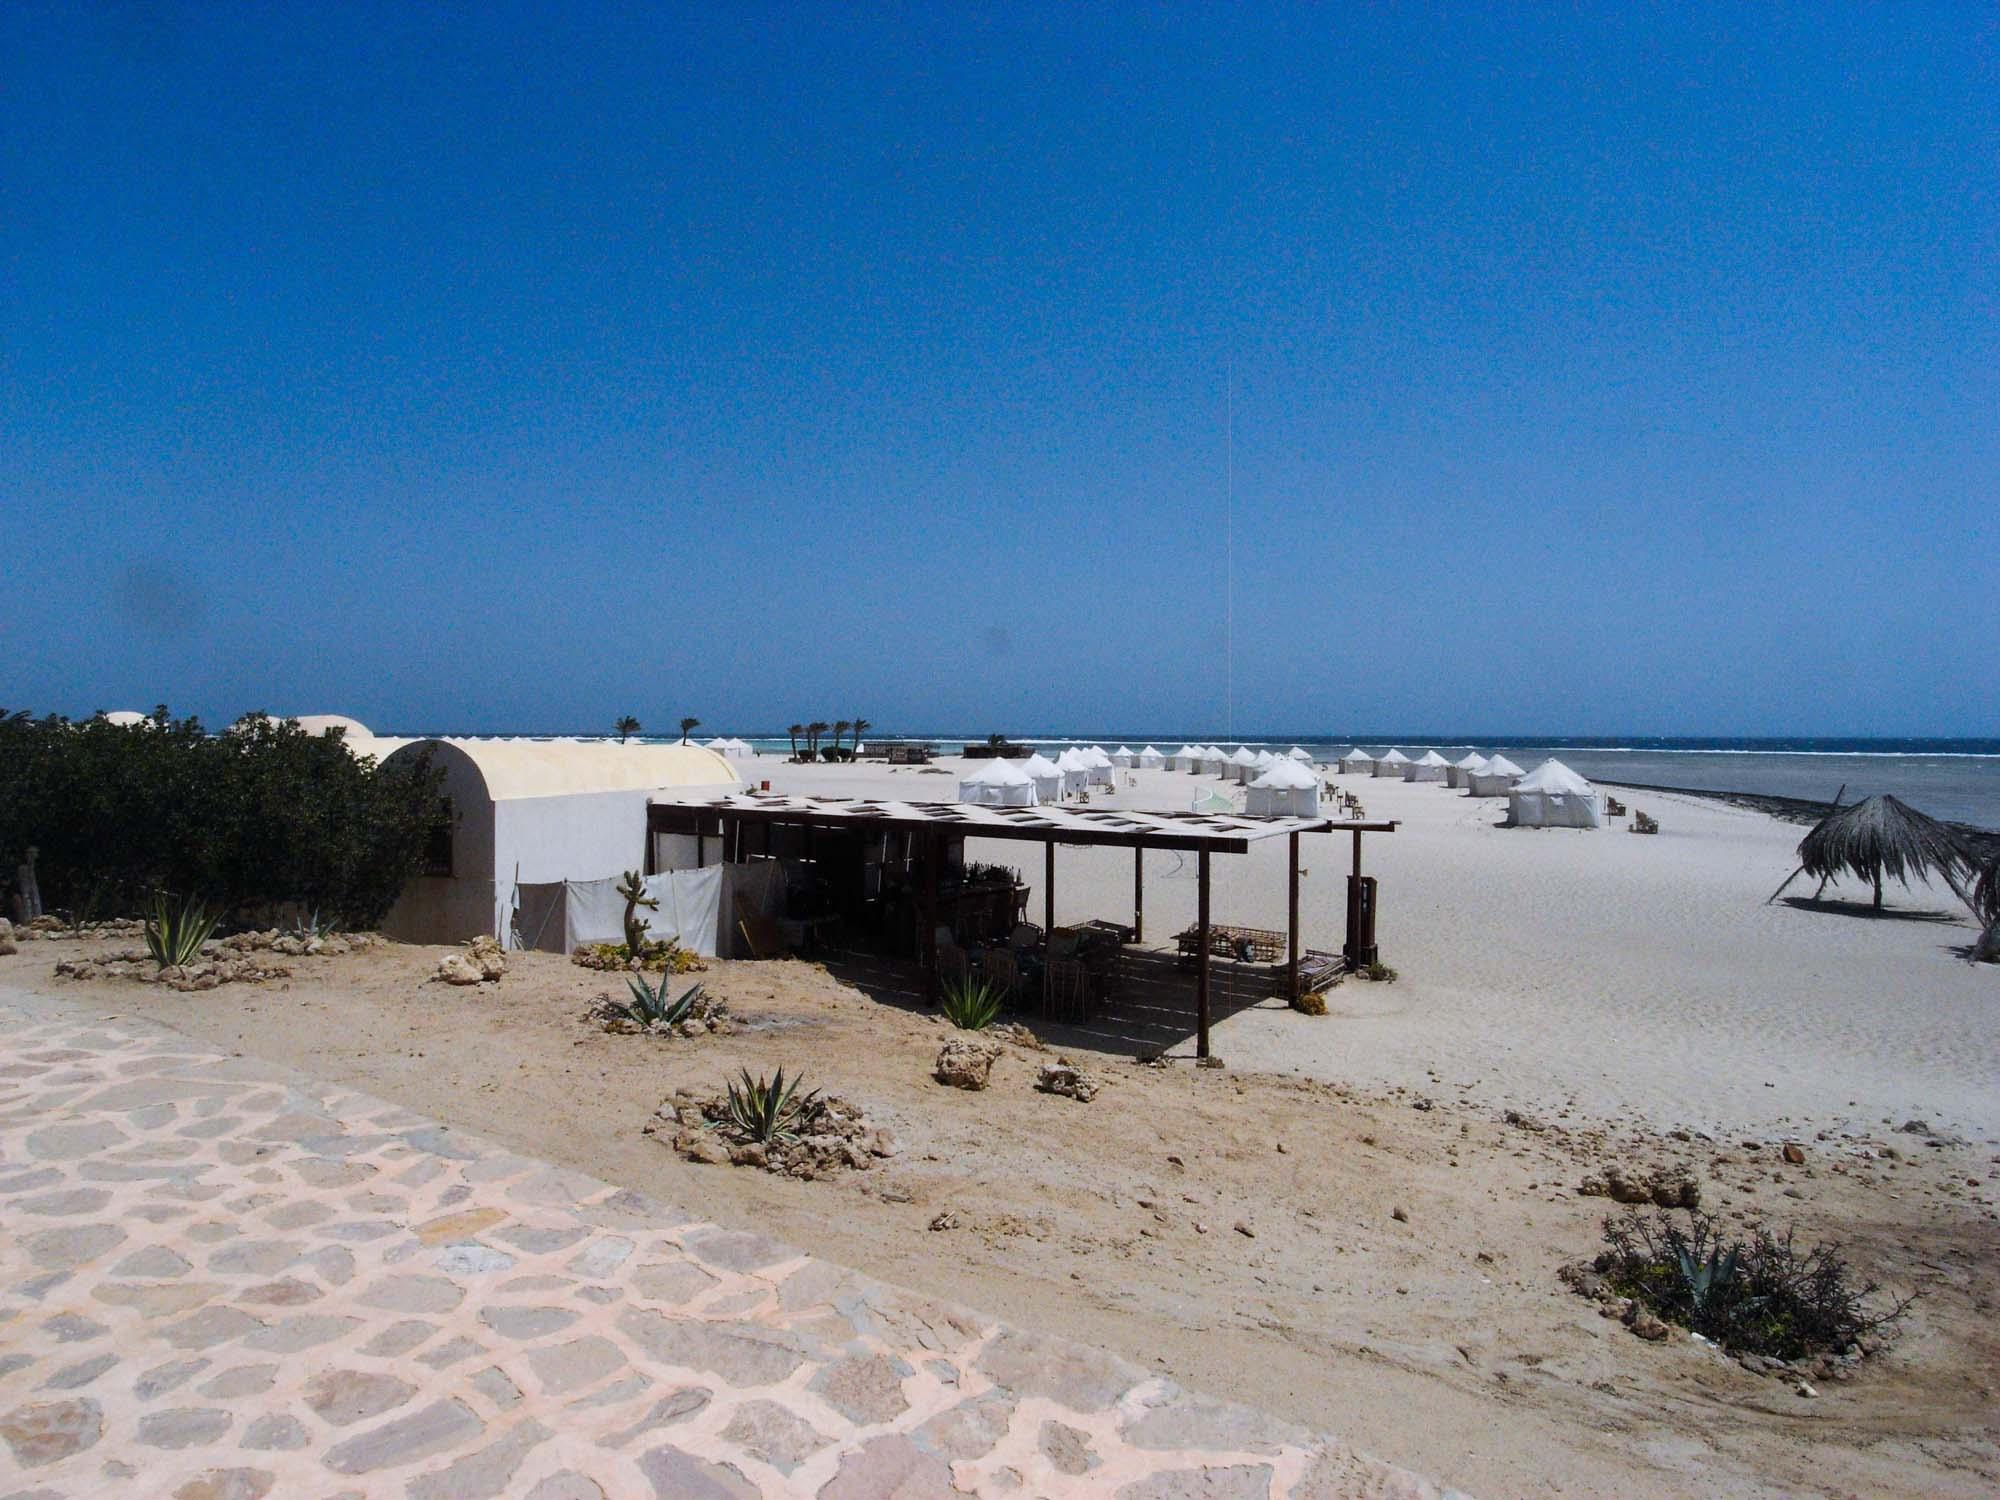 Marsa_Shagra_Red Sea Diving Safari_Tauchen_Rotes_Meer_Ägypten-12